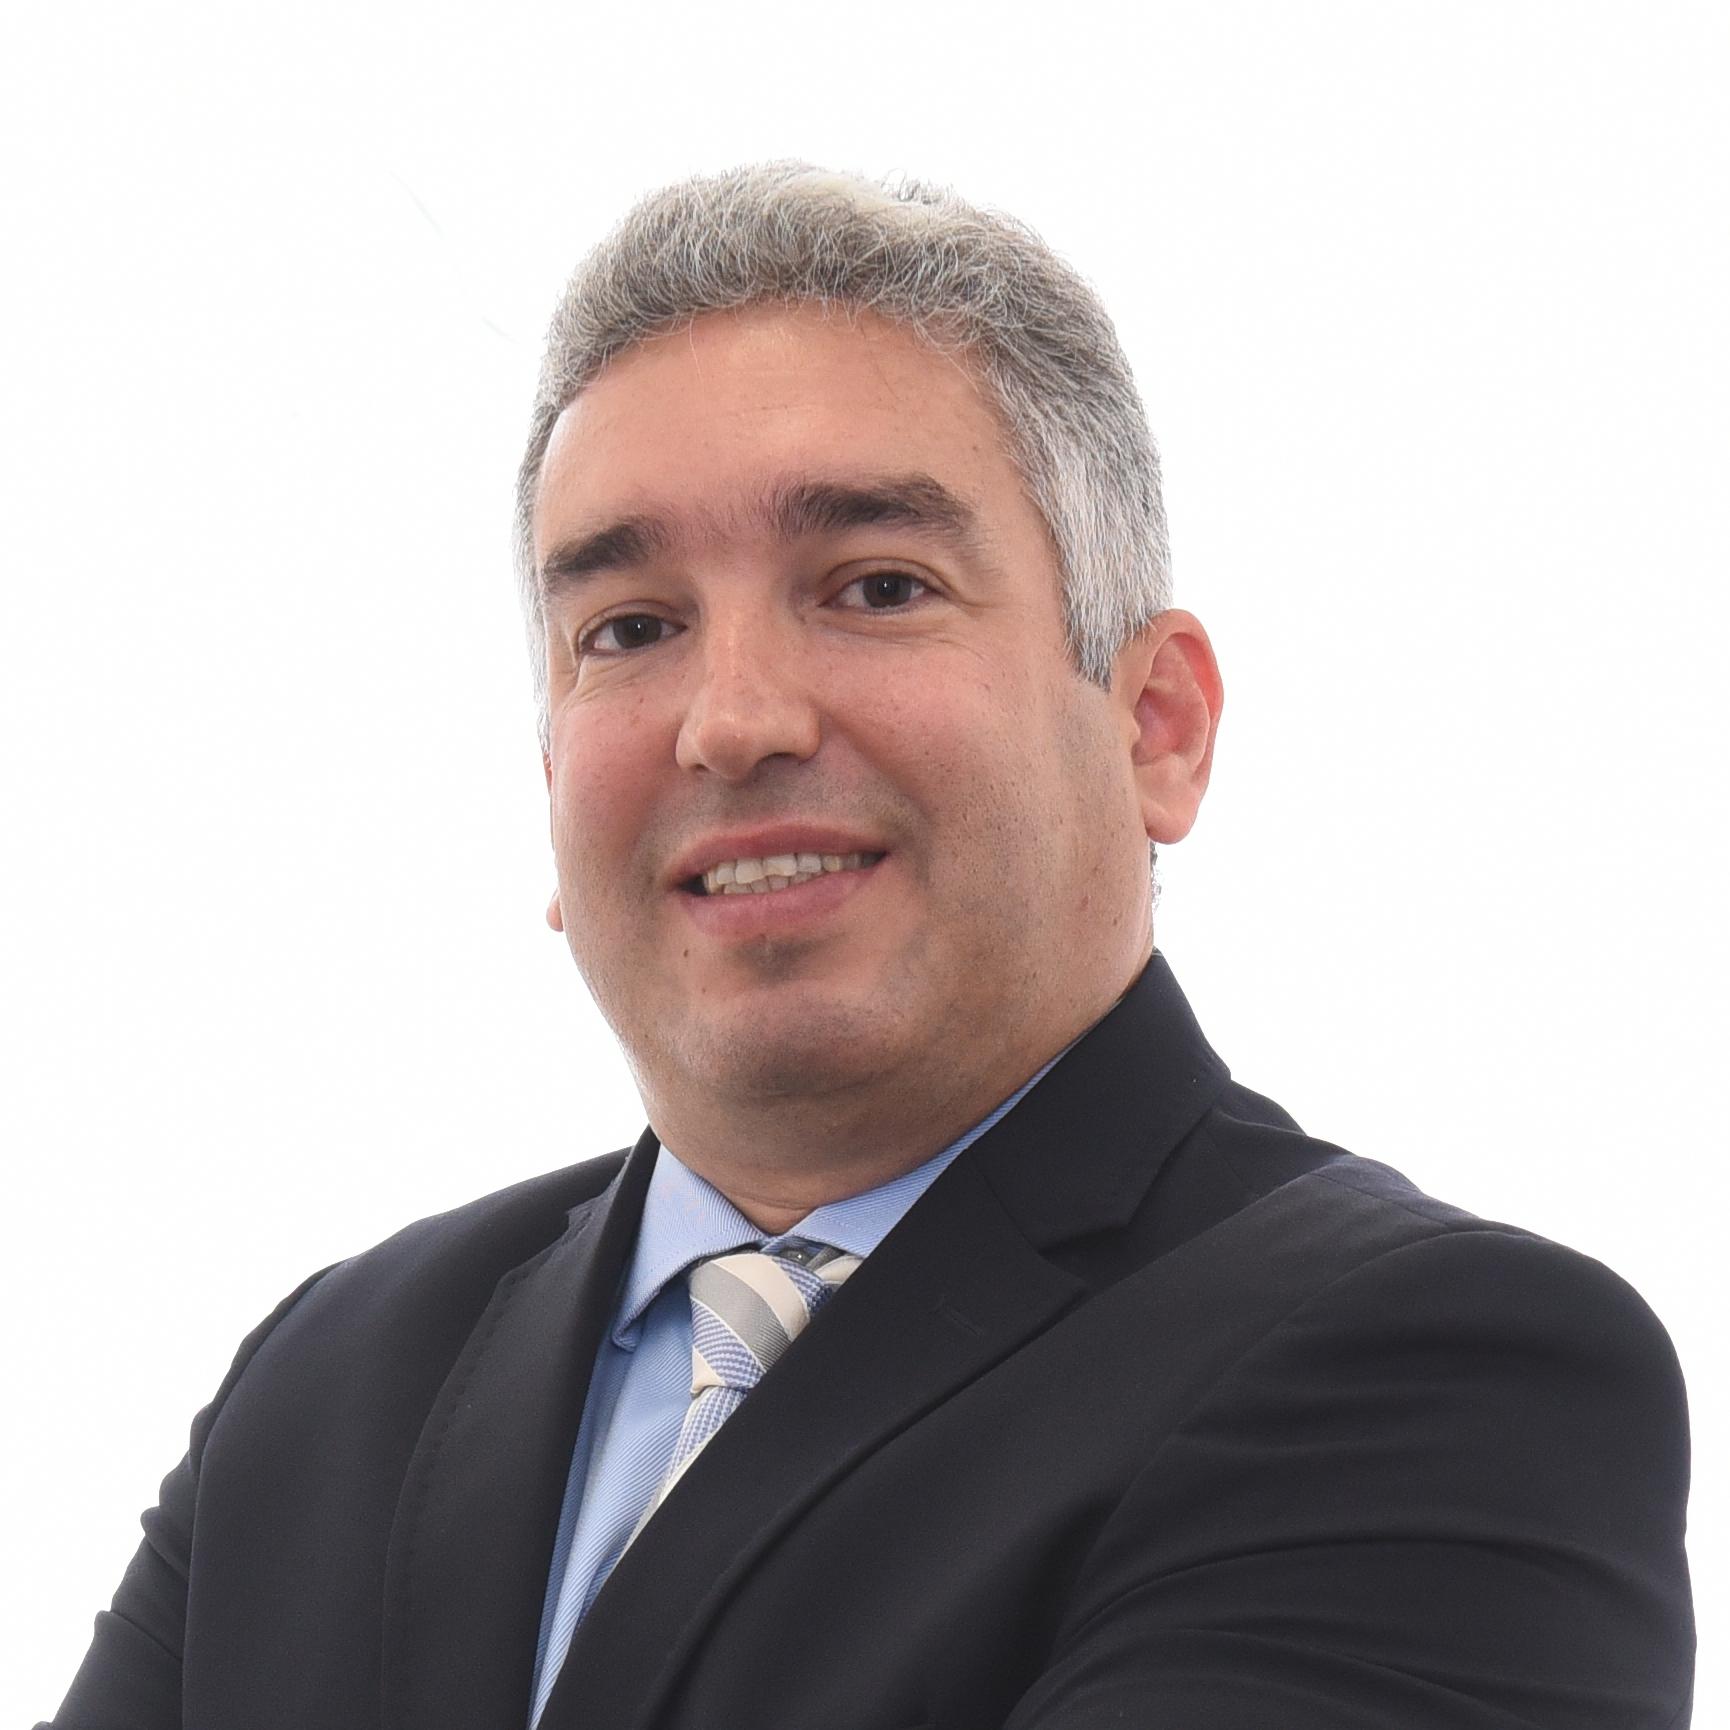 Nicolas Gonçalves Lamas